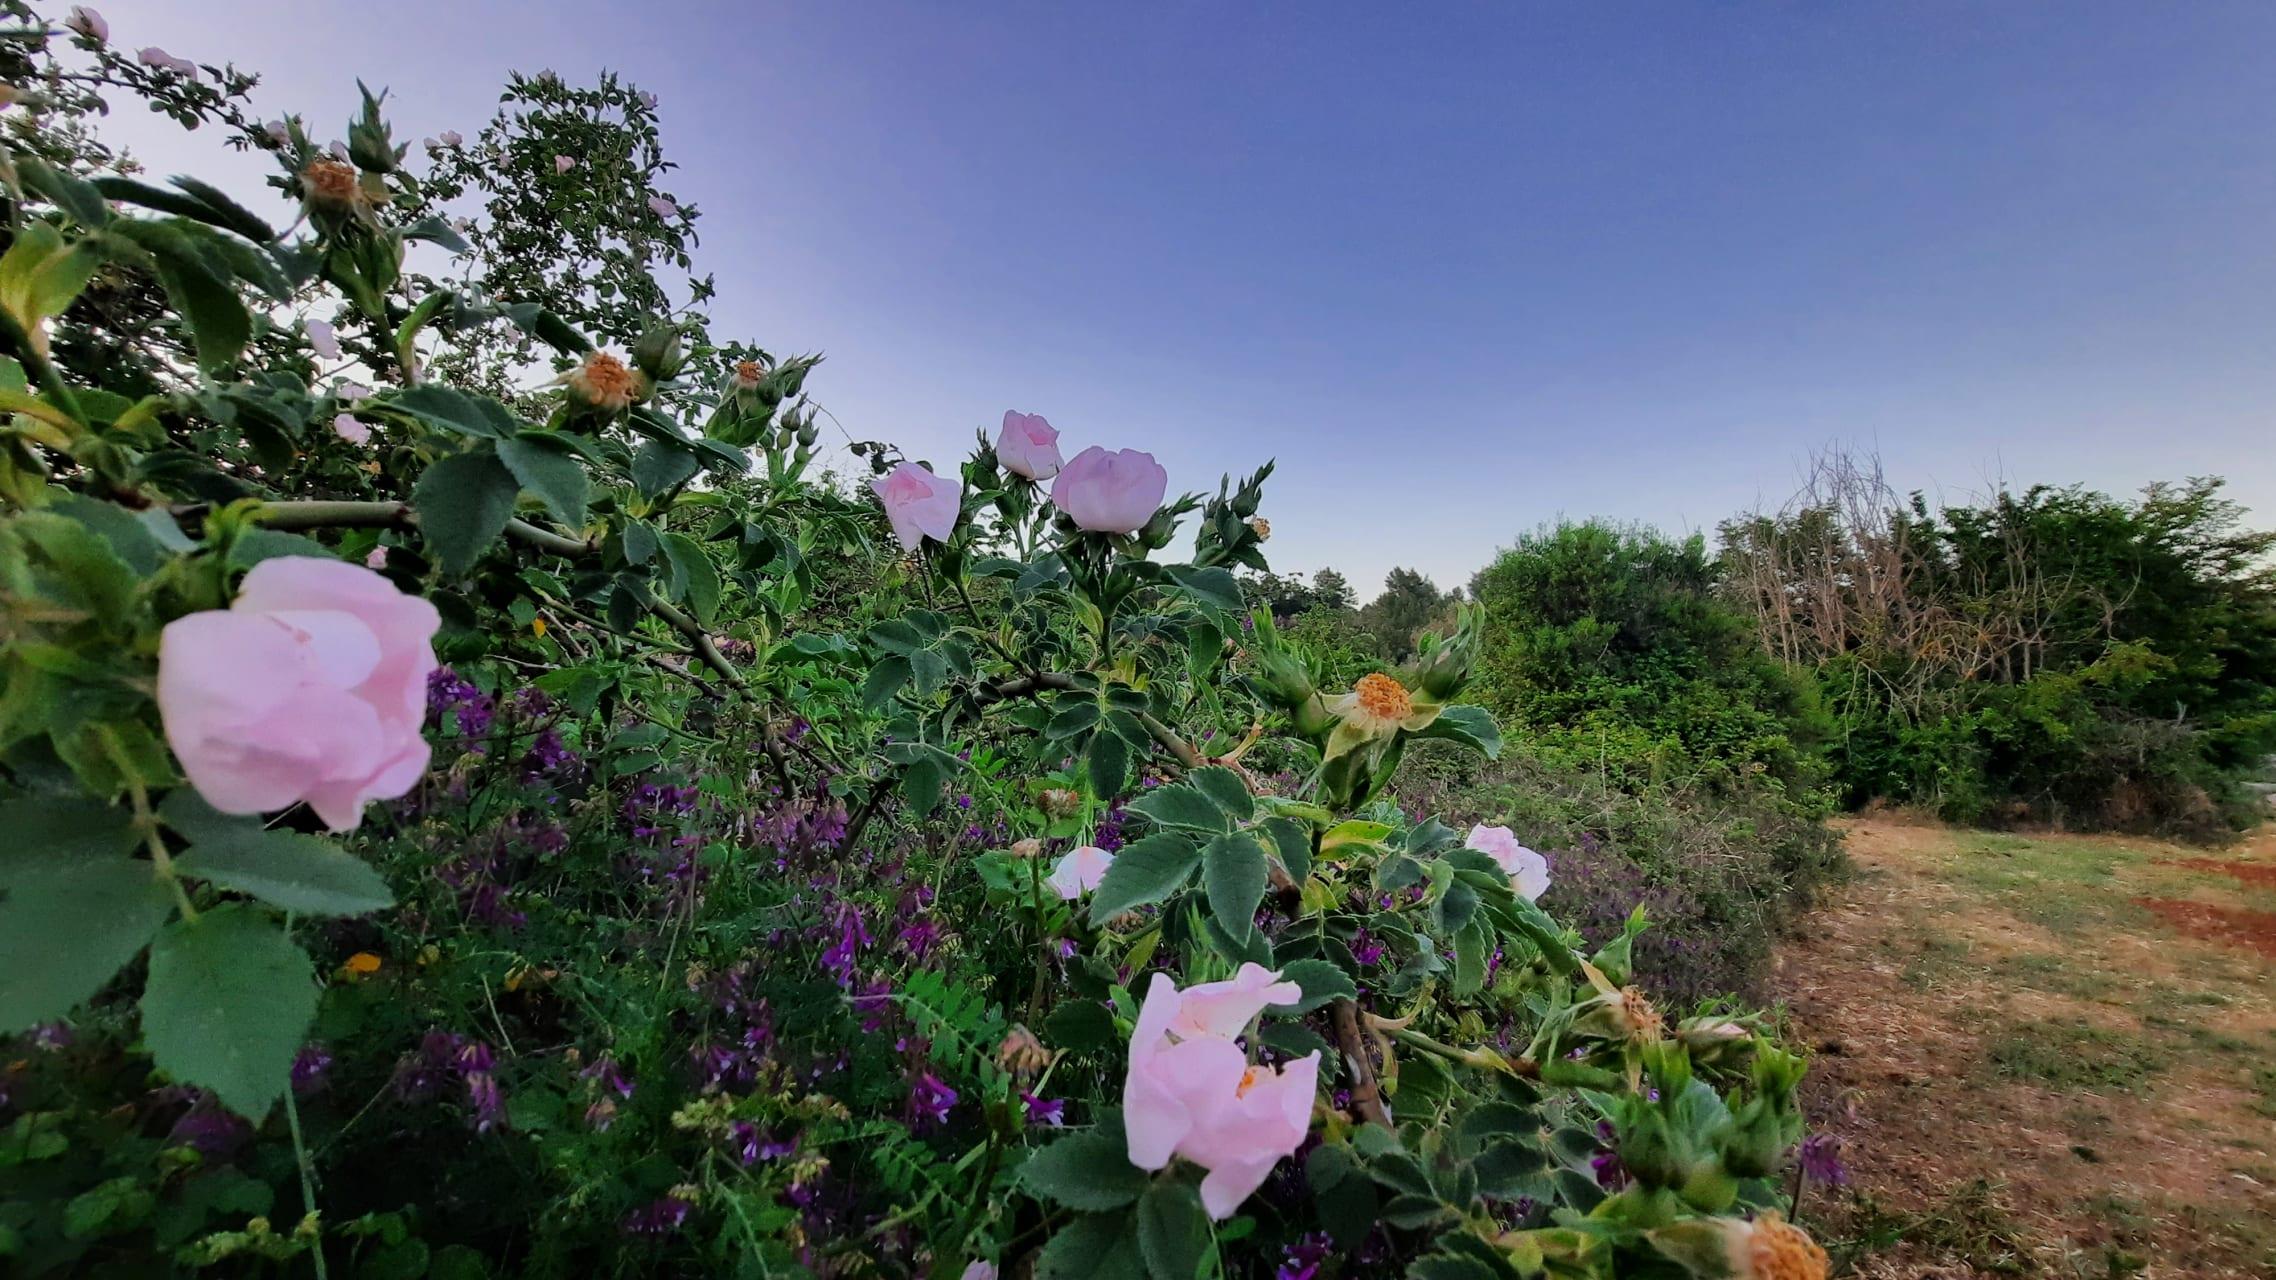 Korcula - Karst Field Wild Rose Bush & Healing Plants